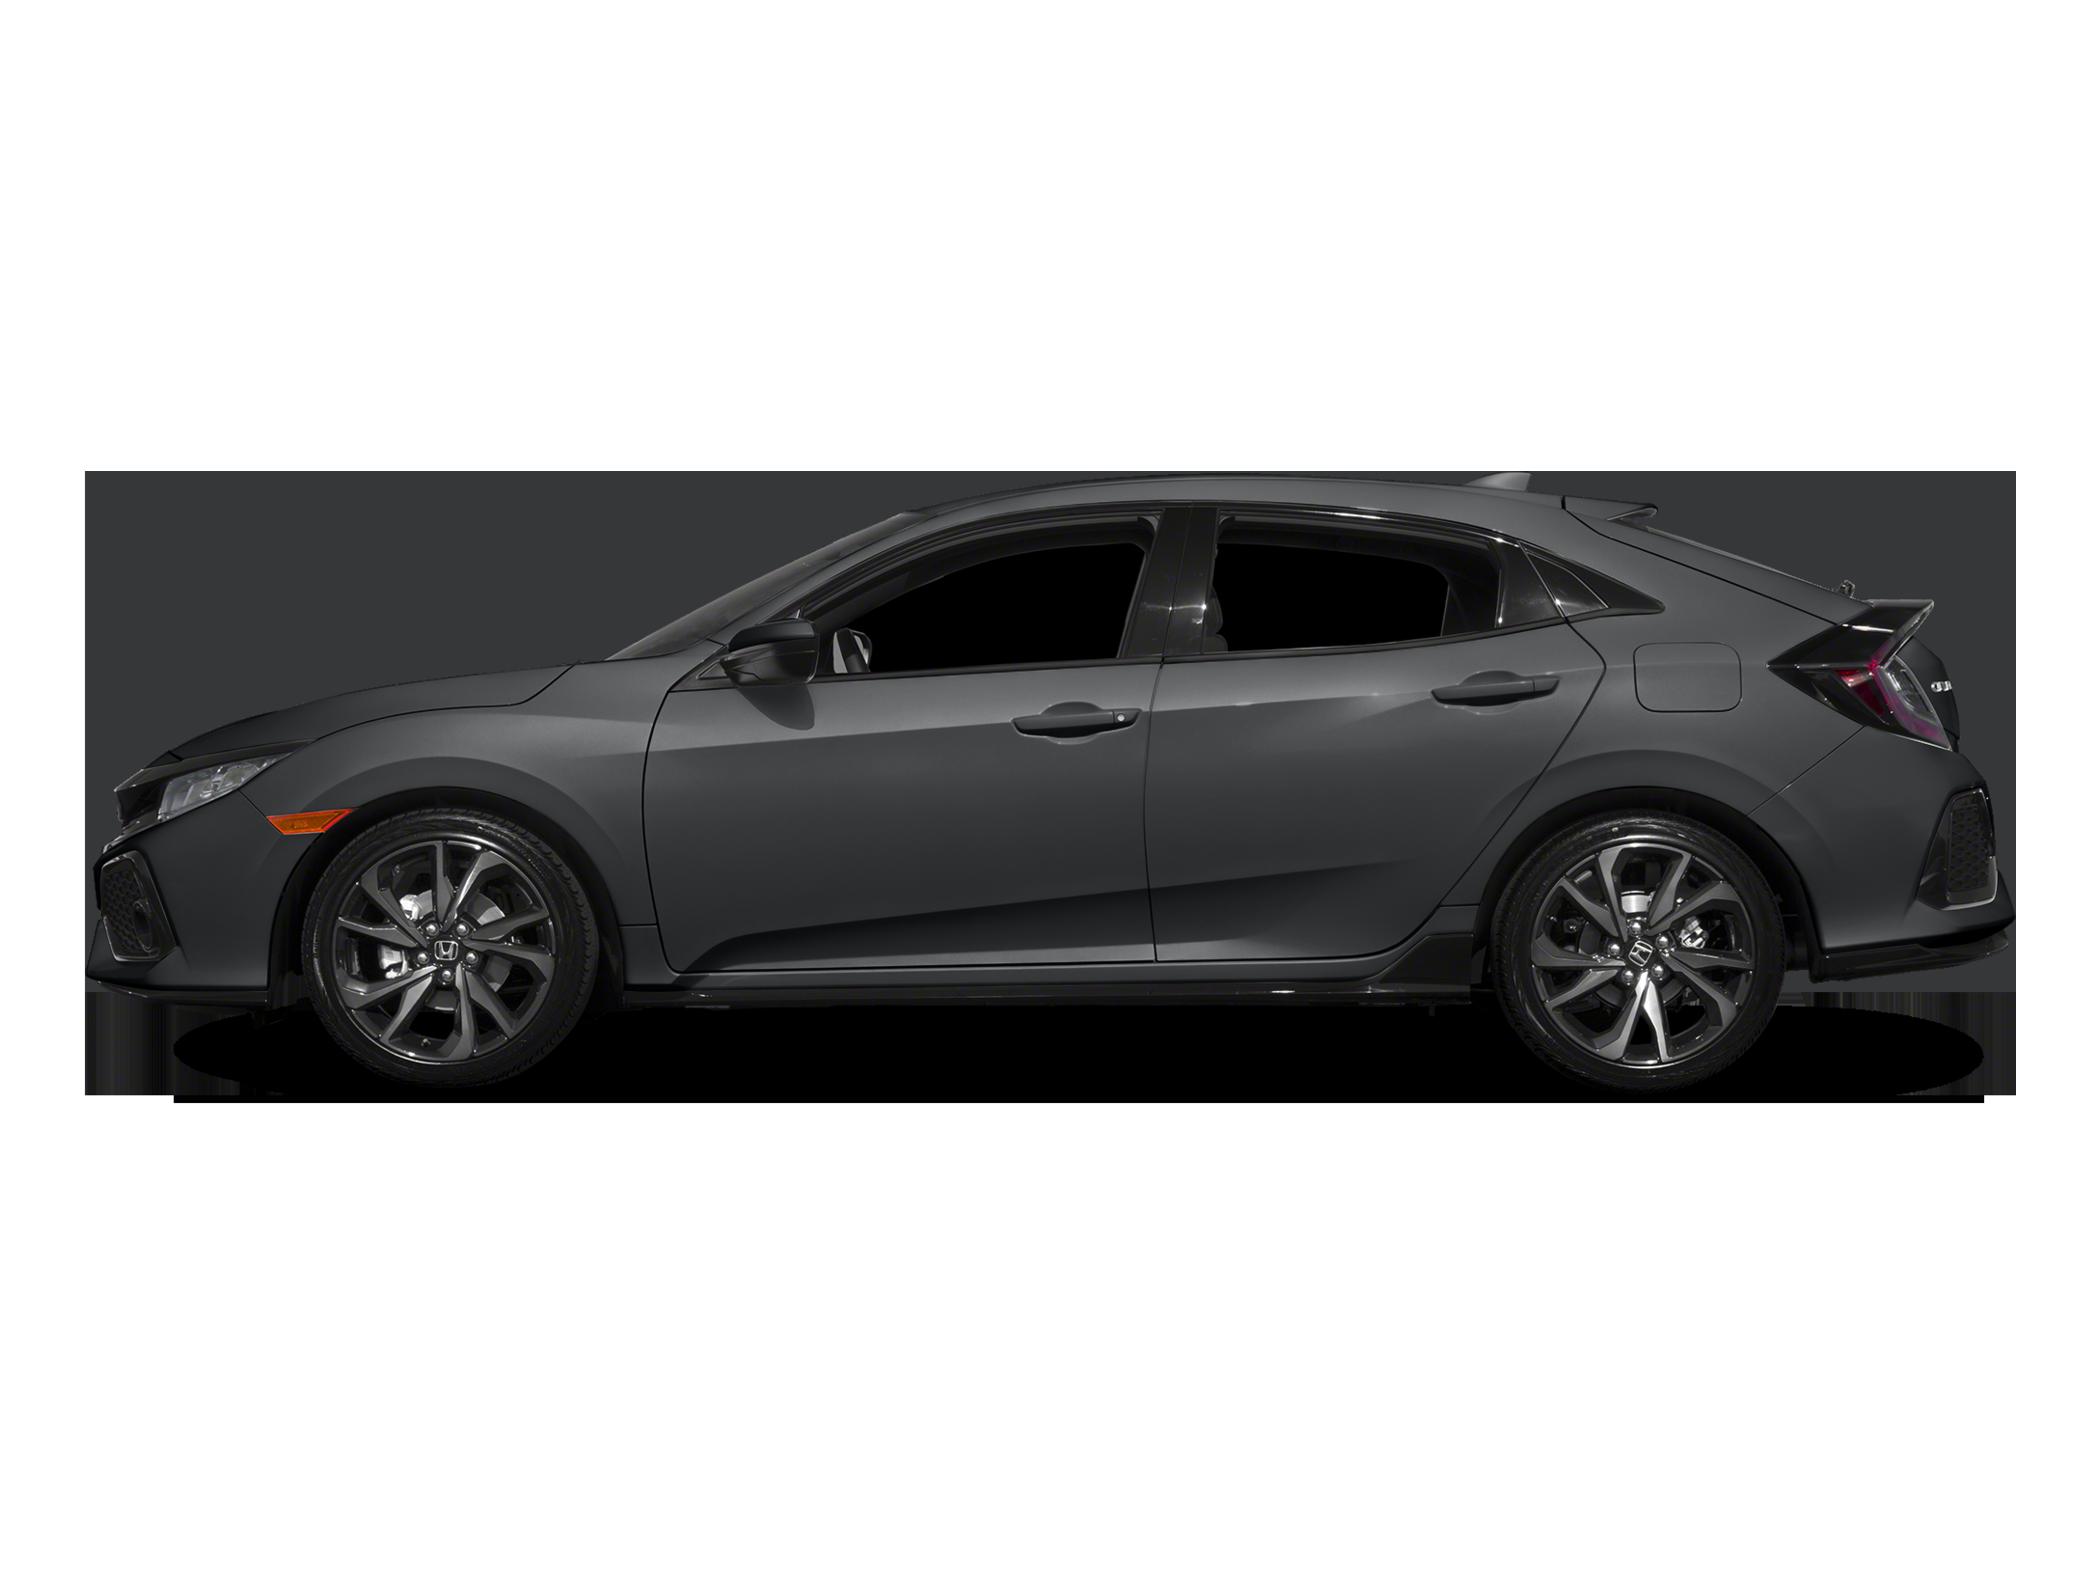 2017 Honda Civic Hatchback Genuine Oem Accessories